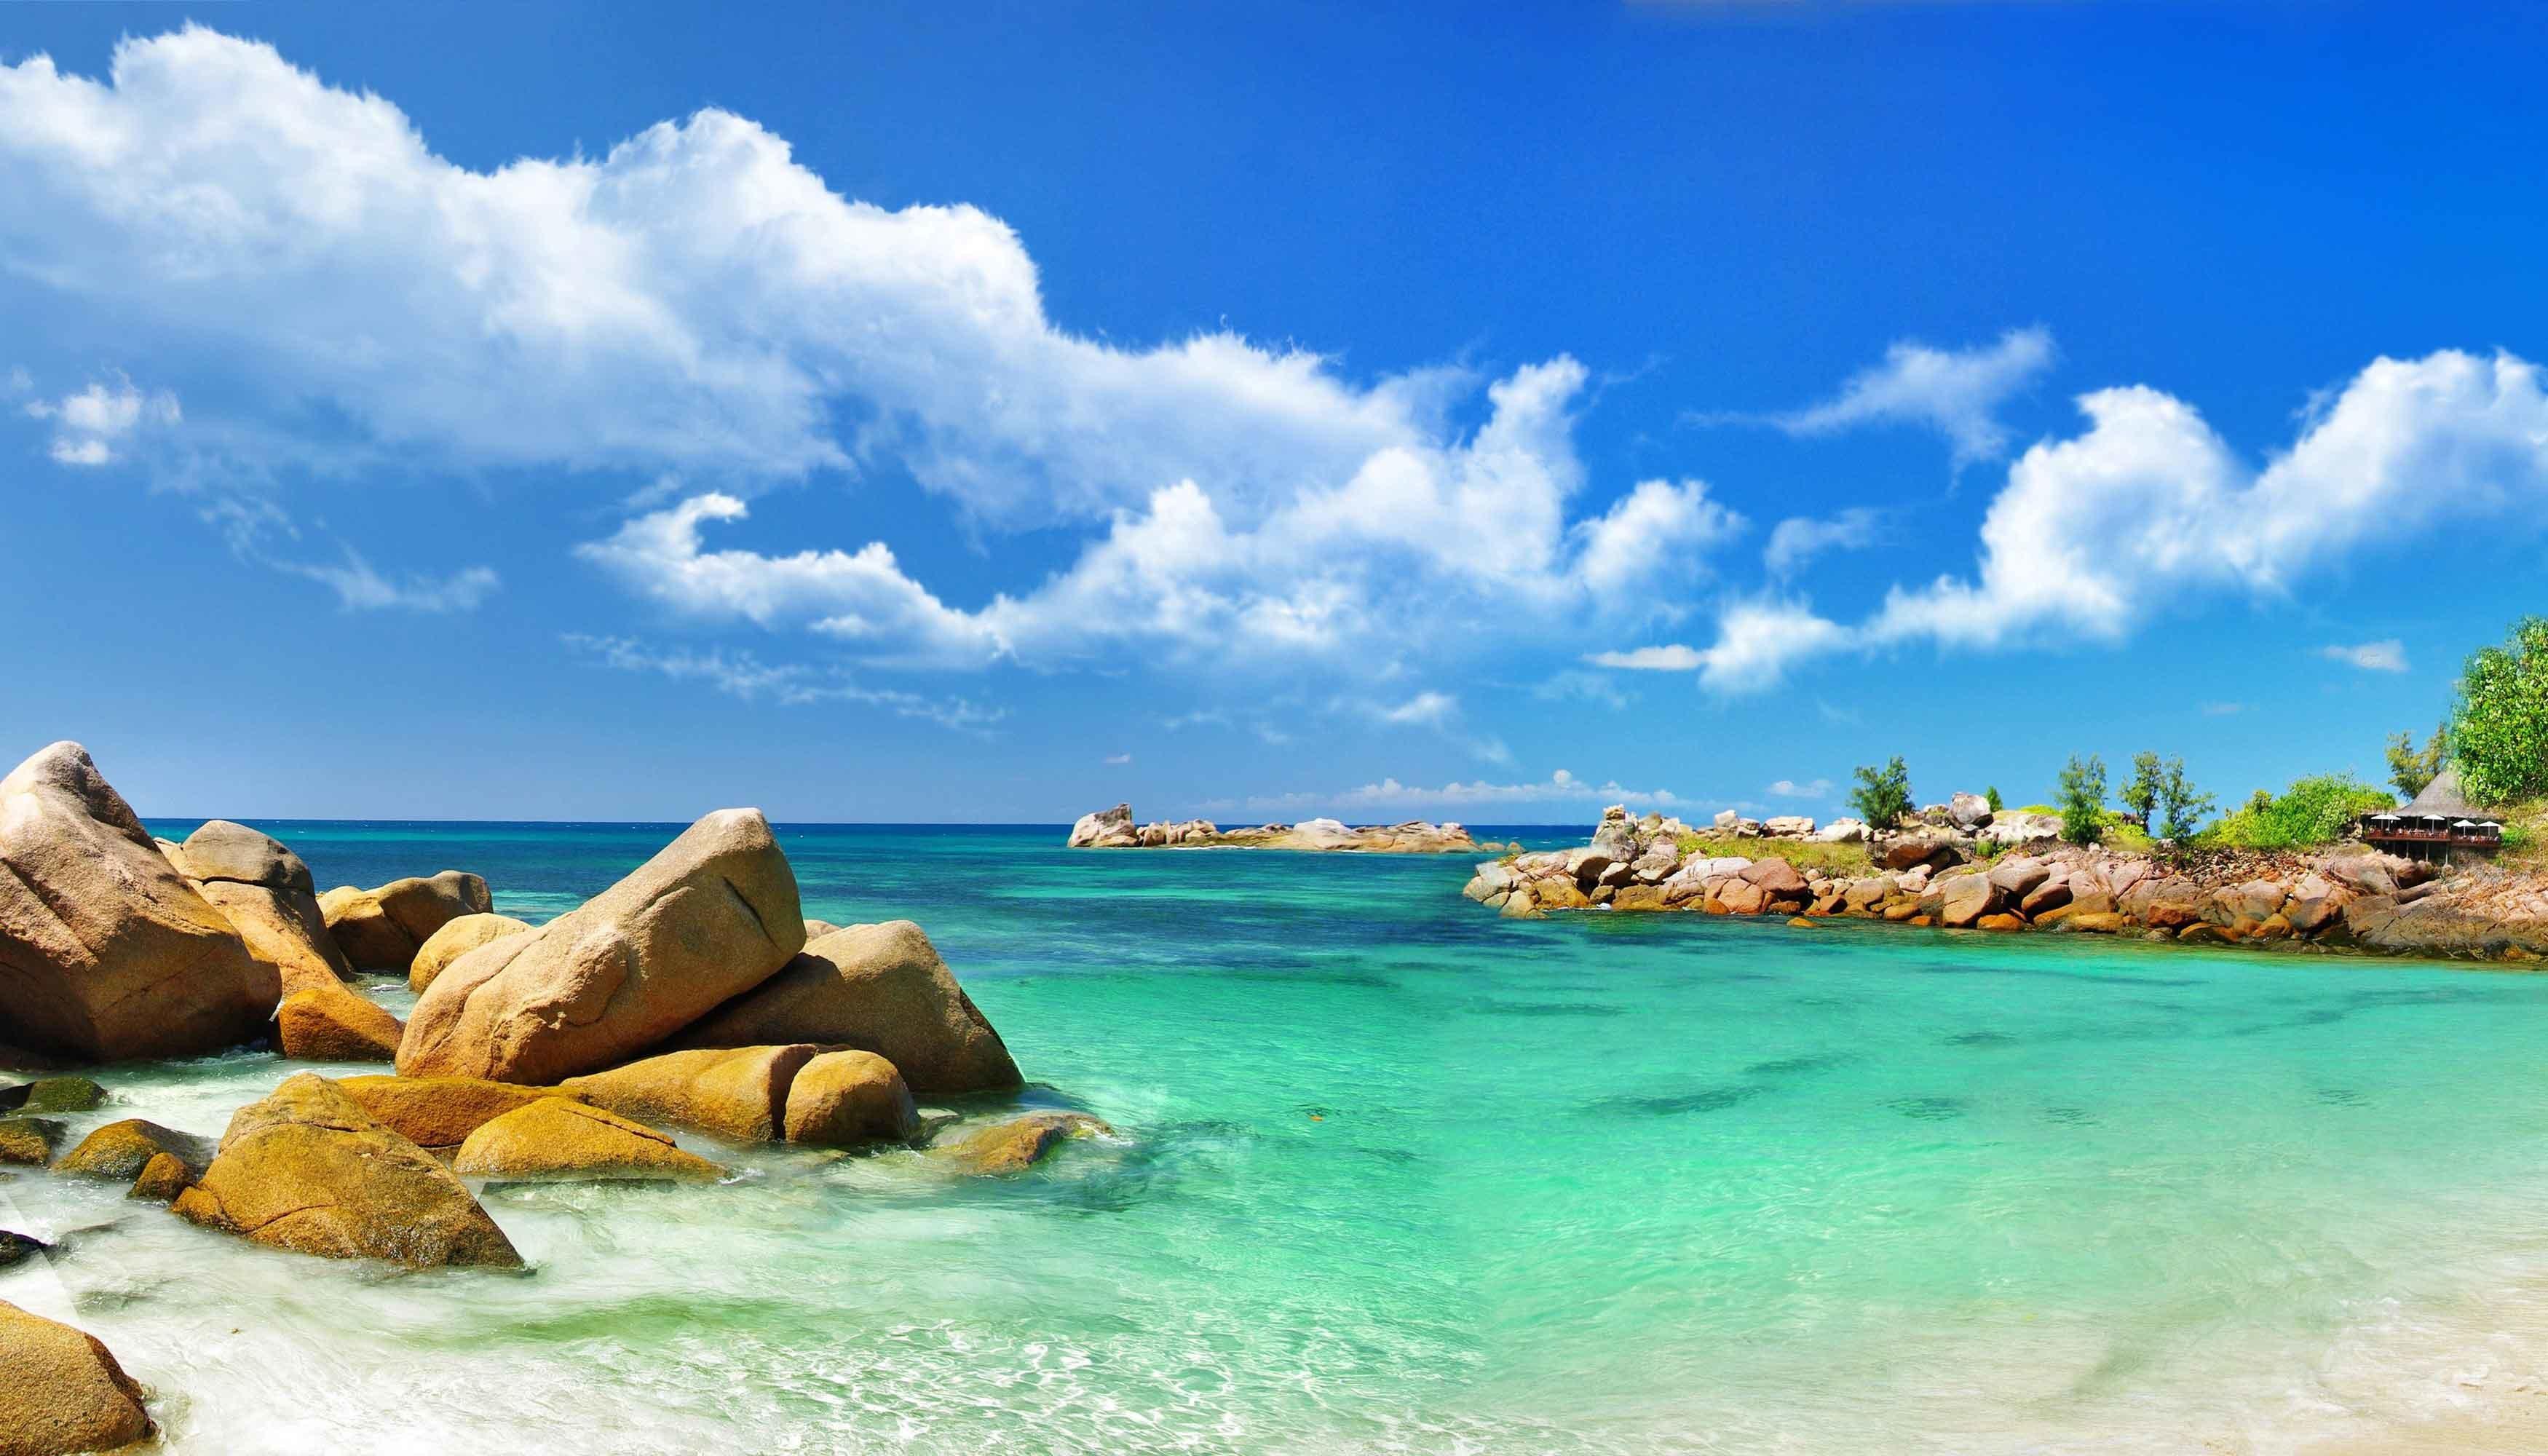 Ocean Desktop Background (70+ Images